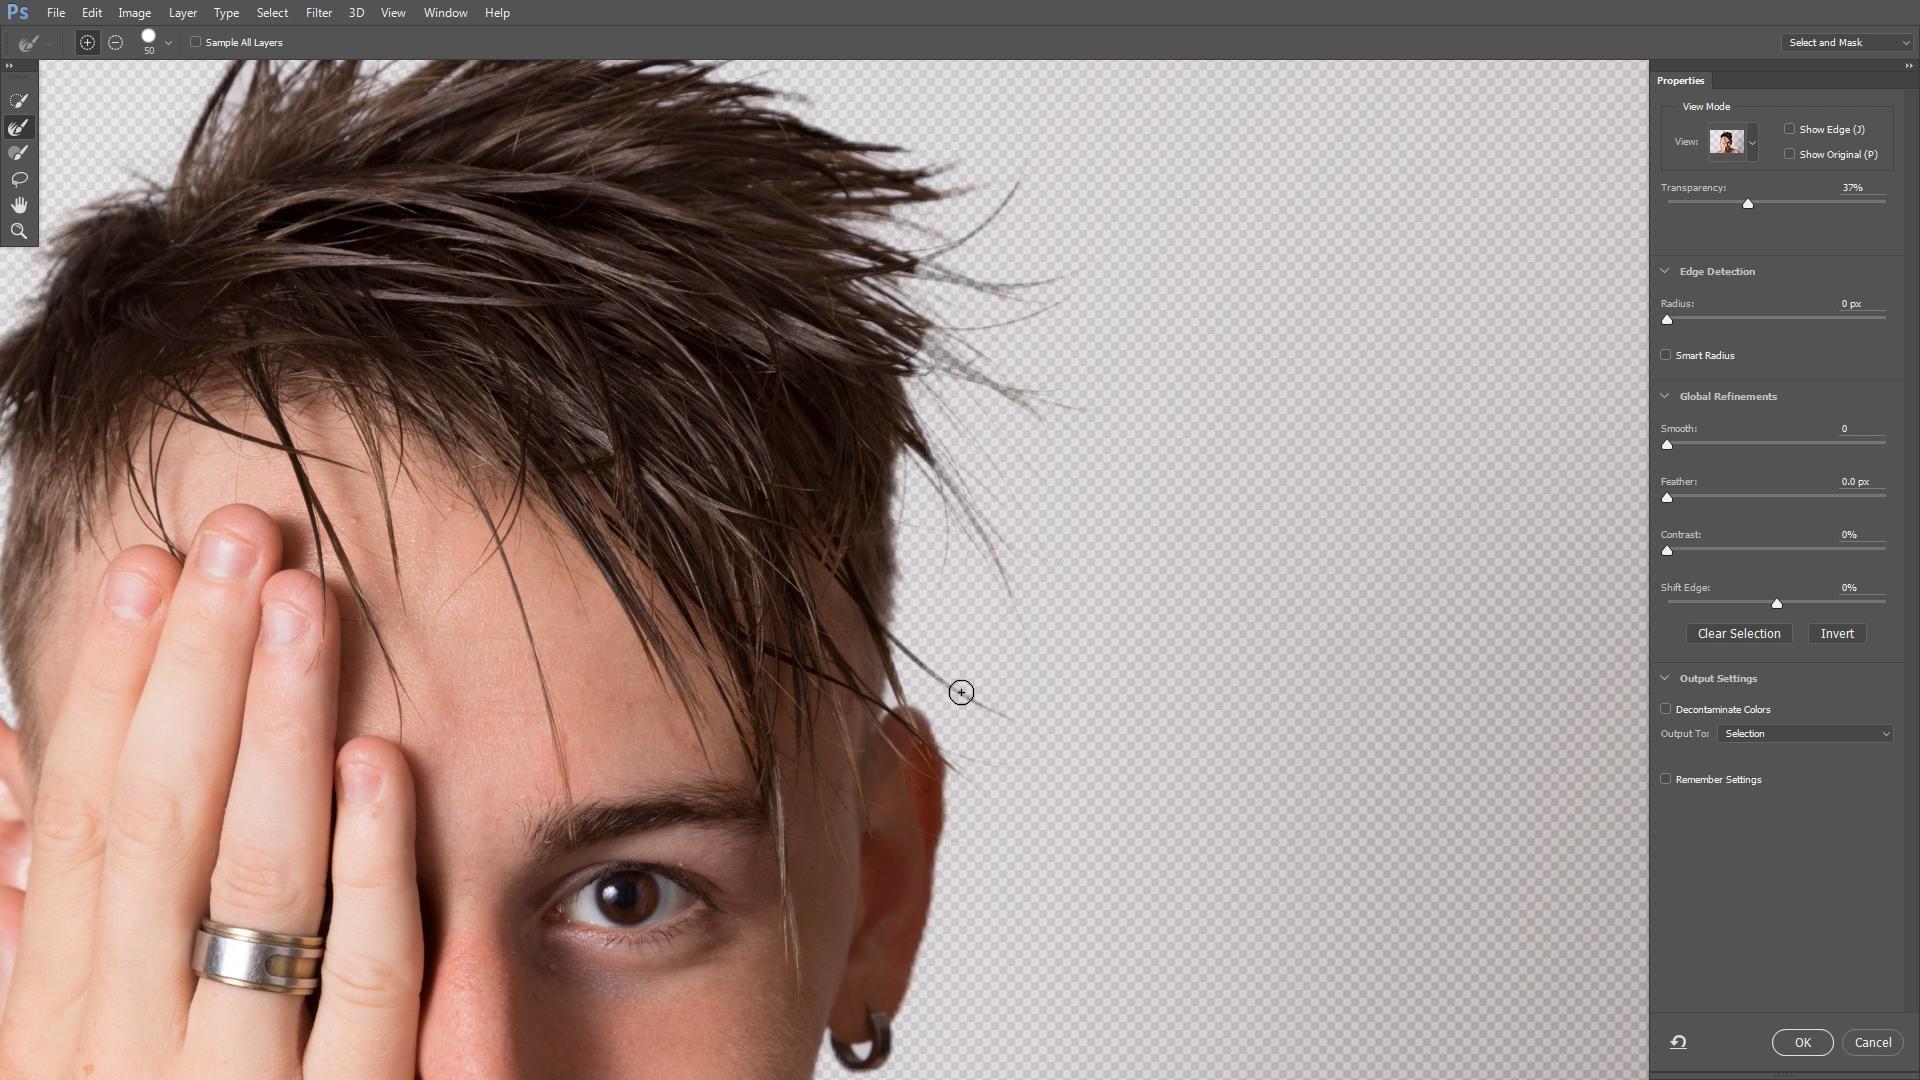 Photoshop CC 2015.5 update